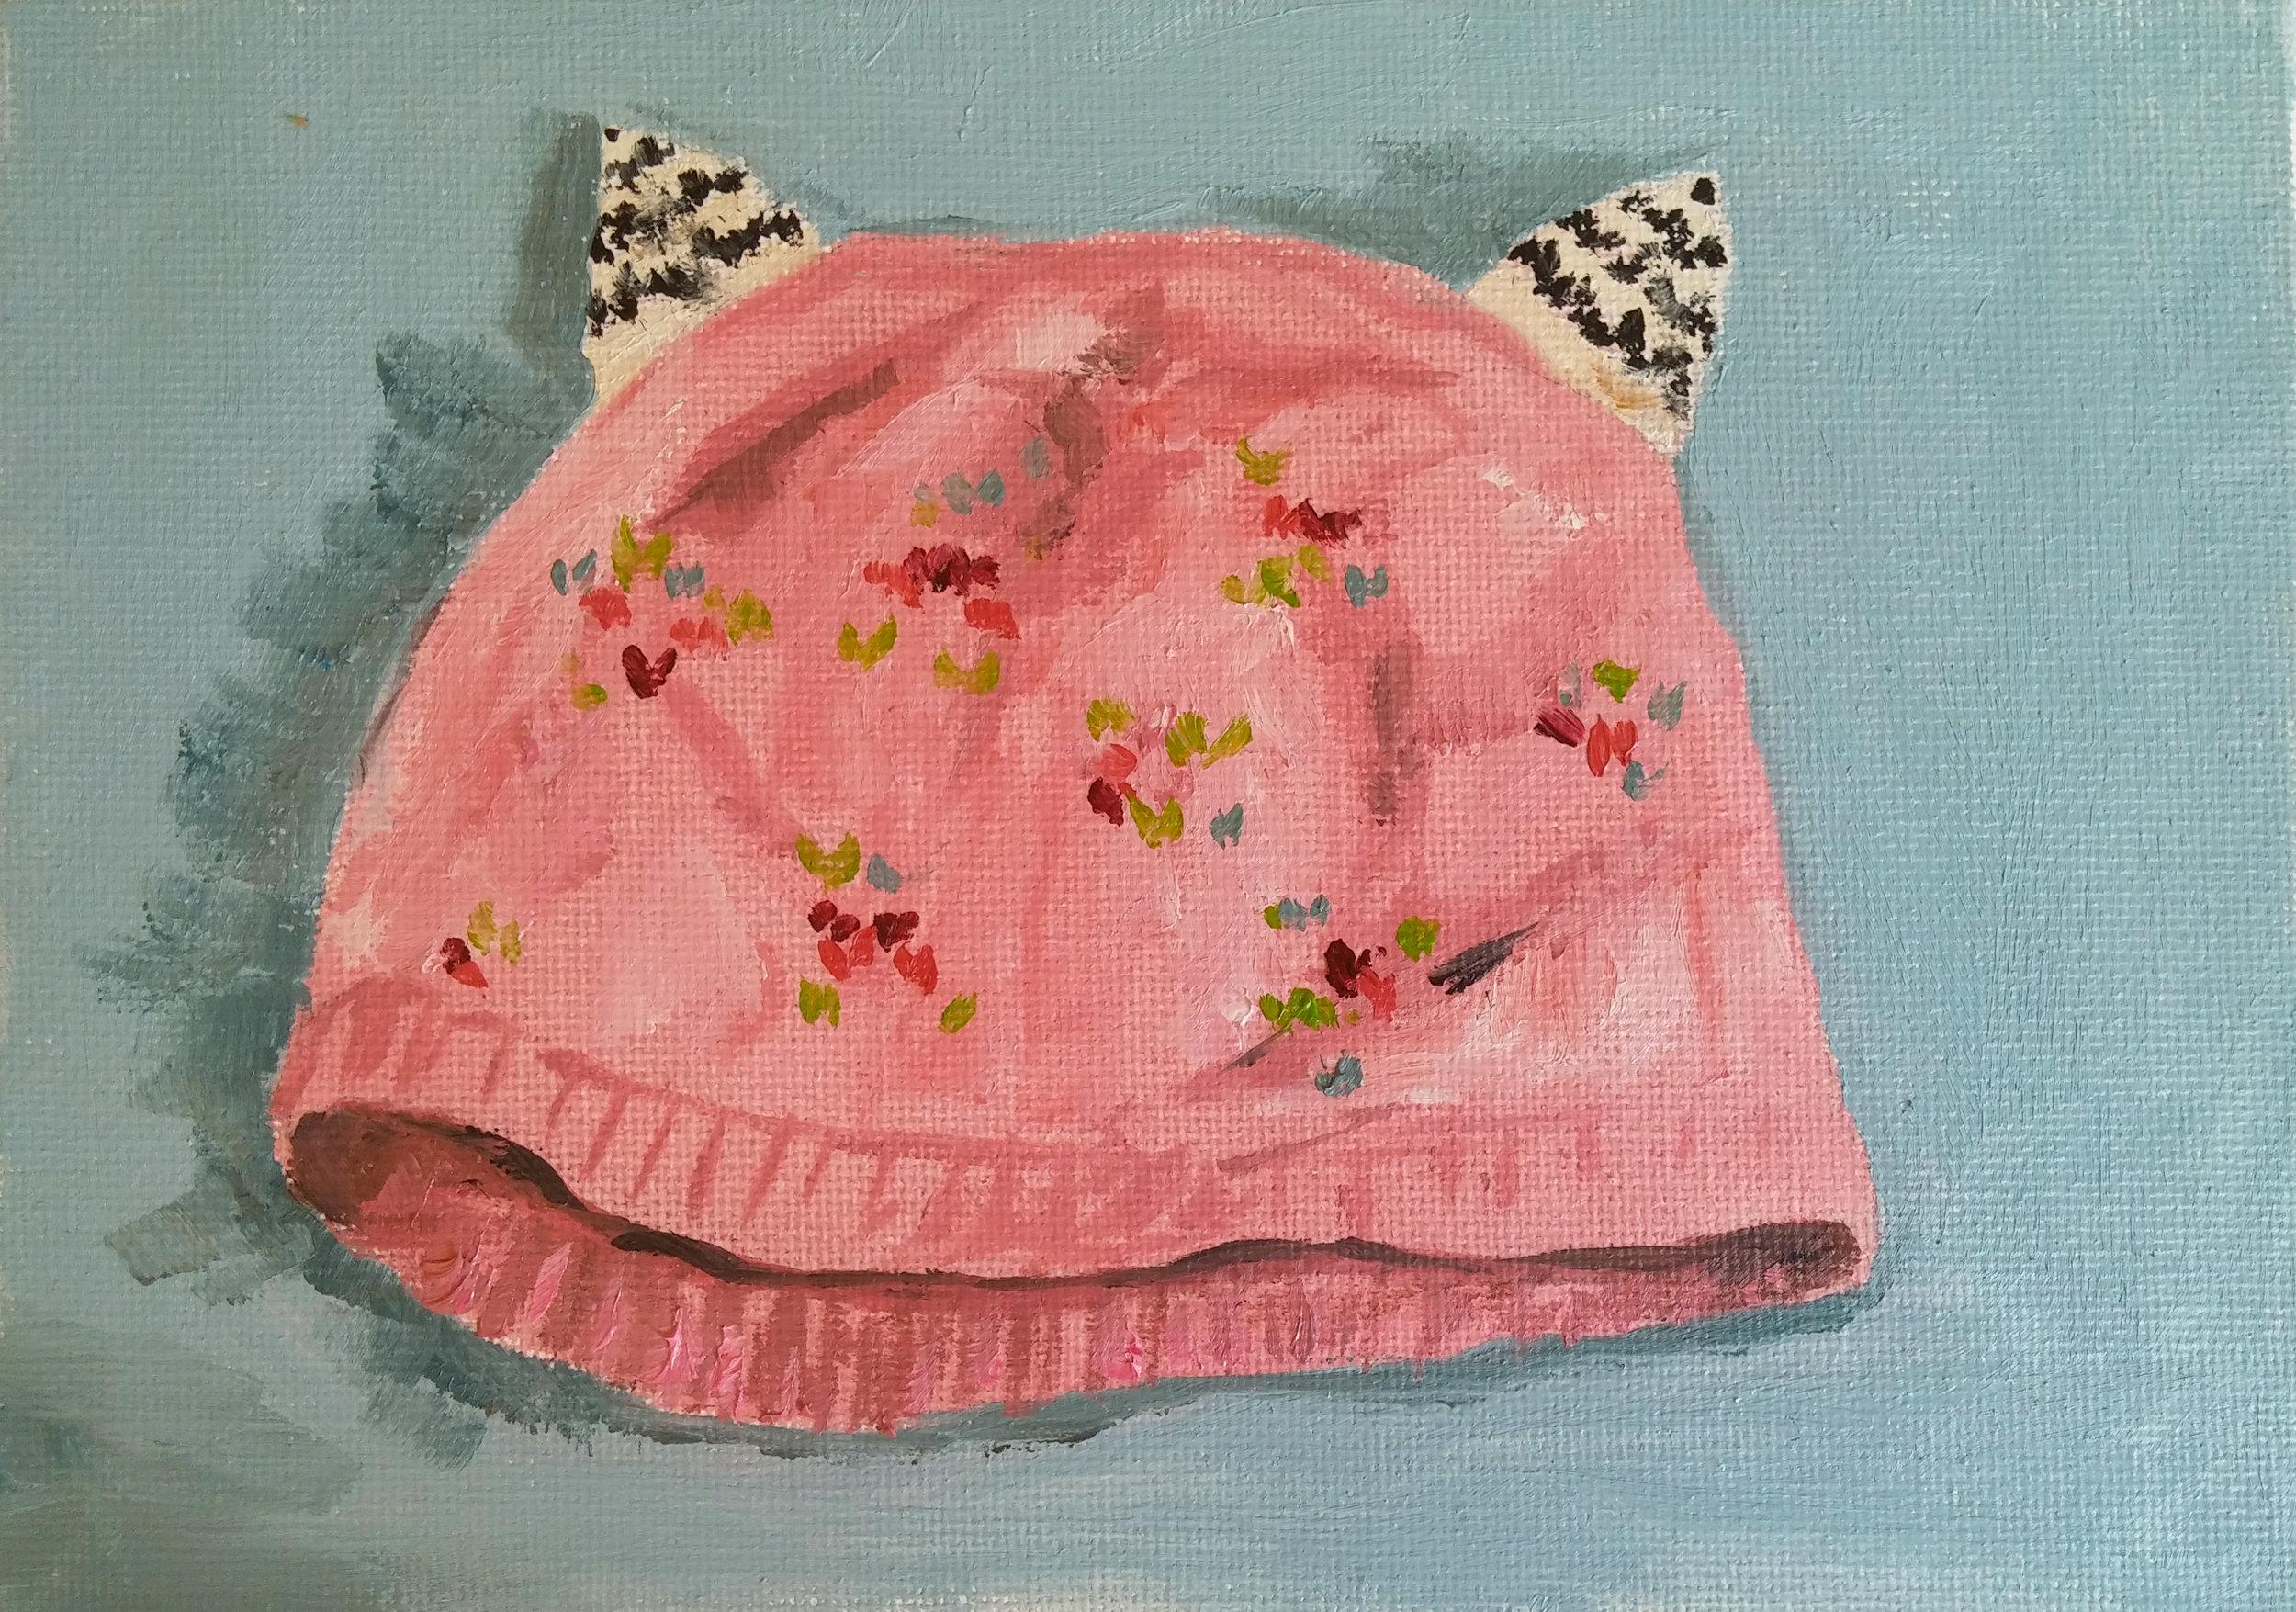 Day 15 - Winter Hat